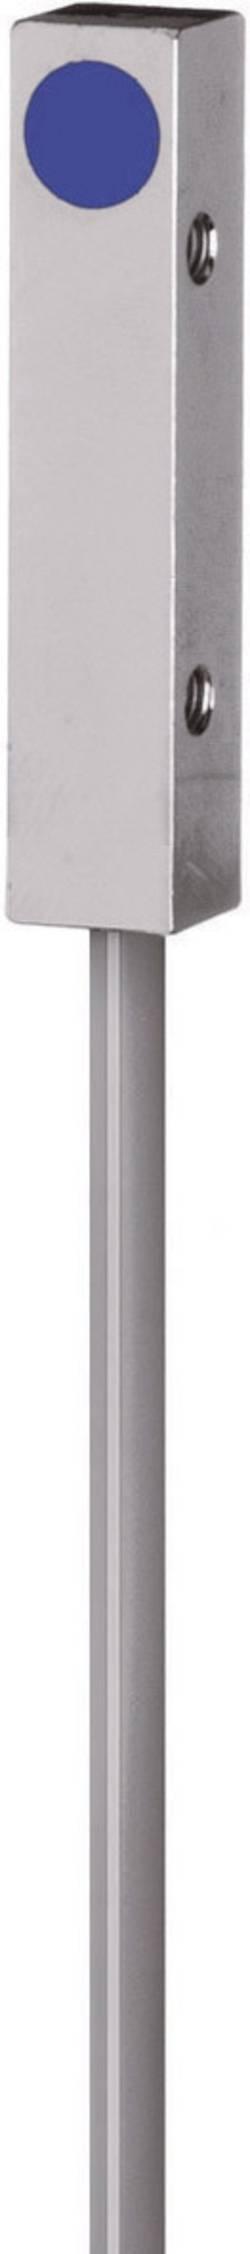 Indukční senzor PNP Contrinex DW-AD-603-C8 (220 220 083), 2 mm, IP67